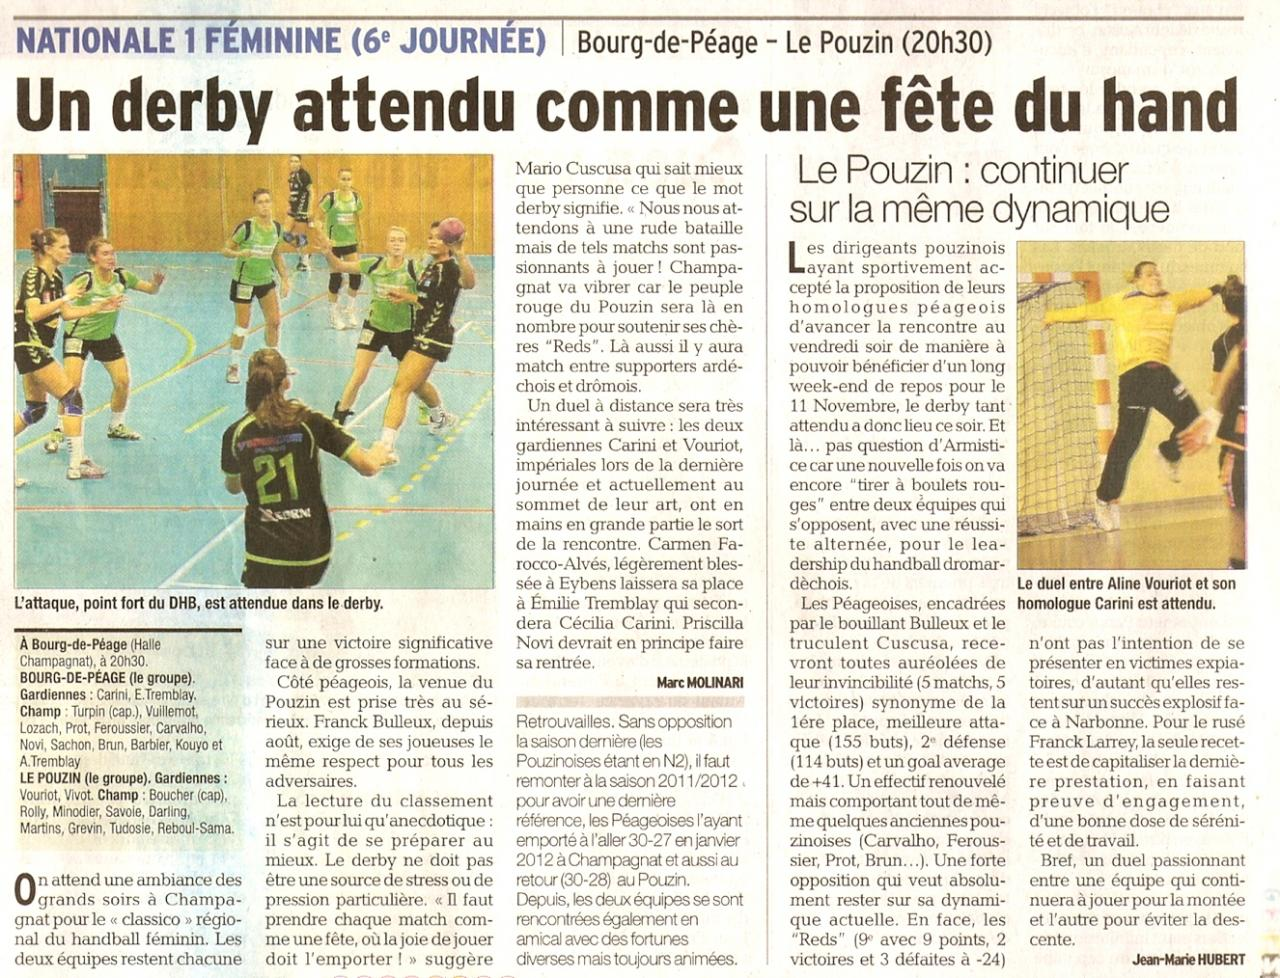 dl-sports-08-11-2013.jpg